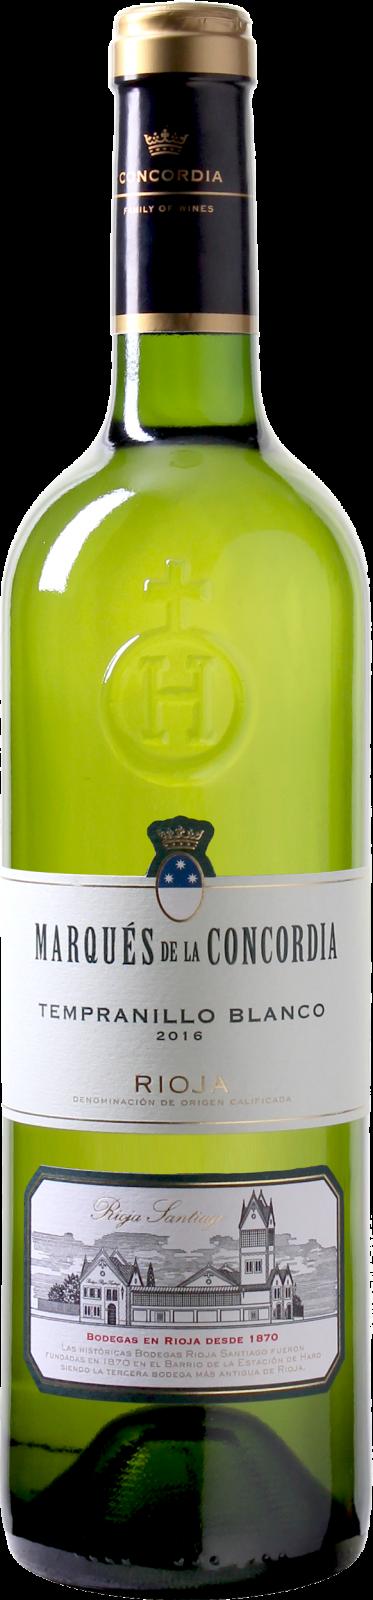 Marqués de la Concordia Rioja Blanco